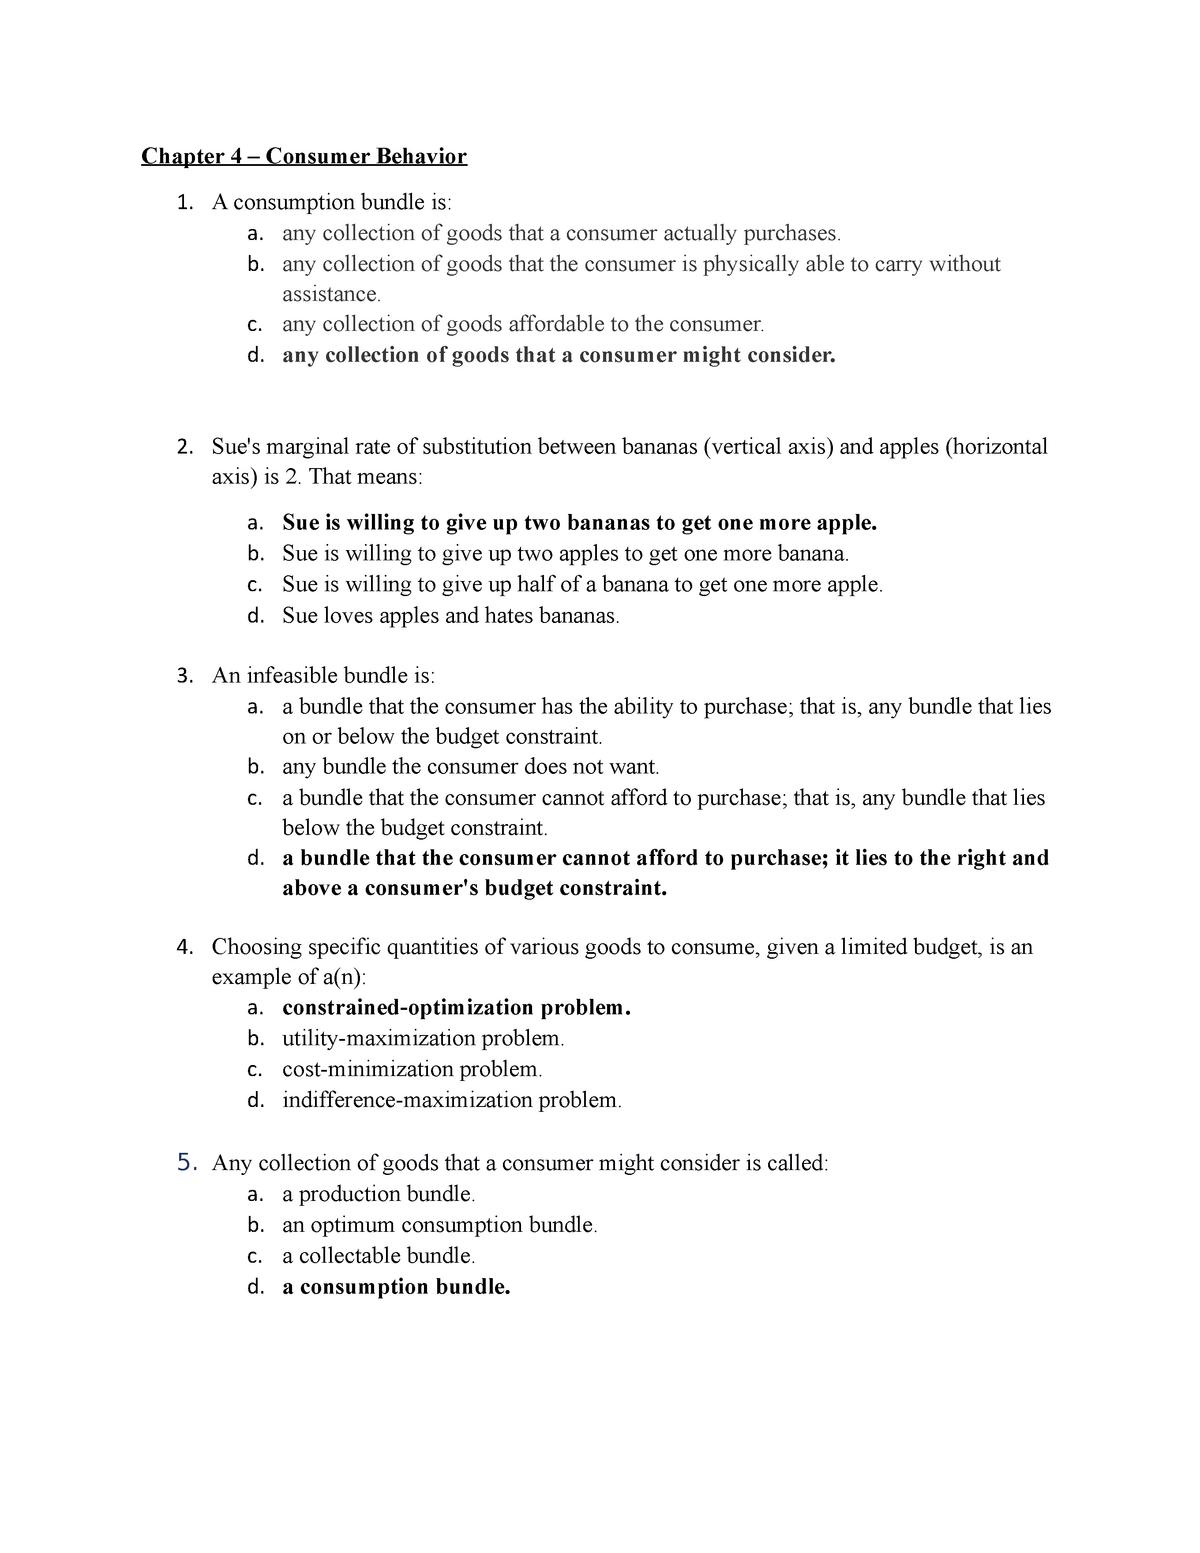 Chapter 4 - Consumer Behavior - ECON 302: Intermediate